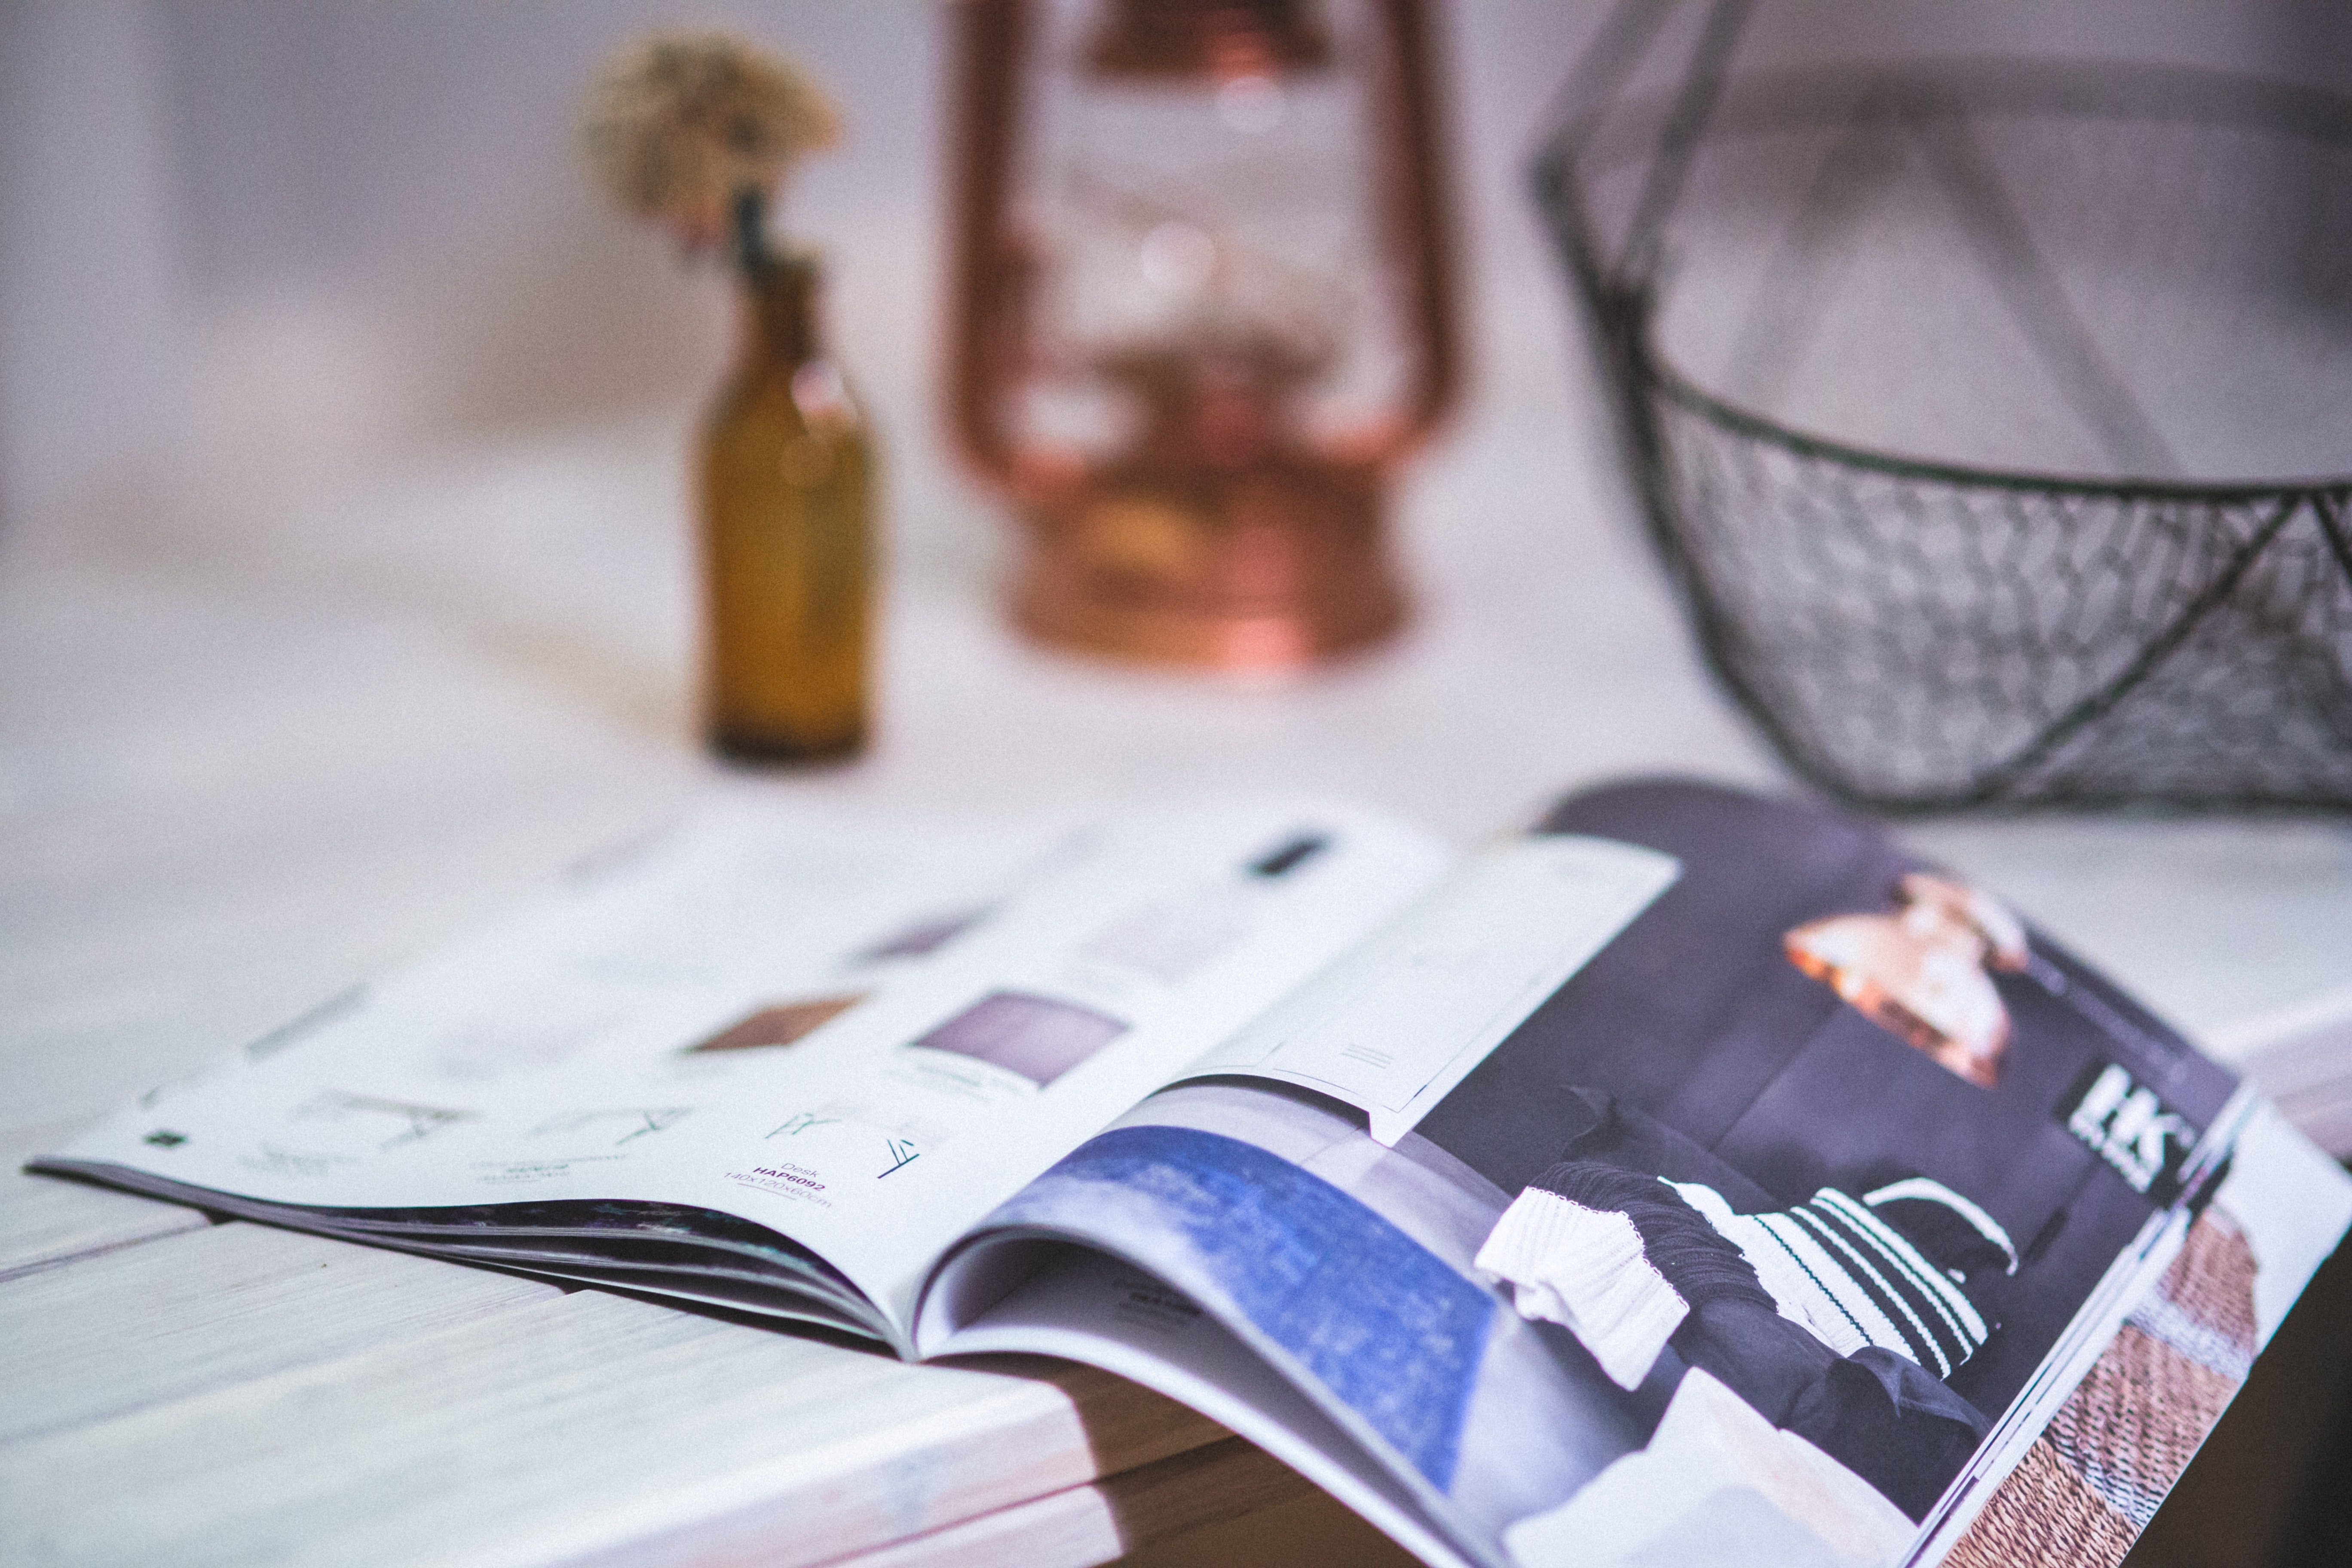 Detail of open magazine, Newspaper, Writing, Wood, Still life, HQ Photo